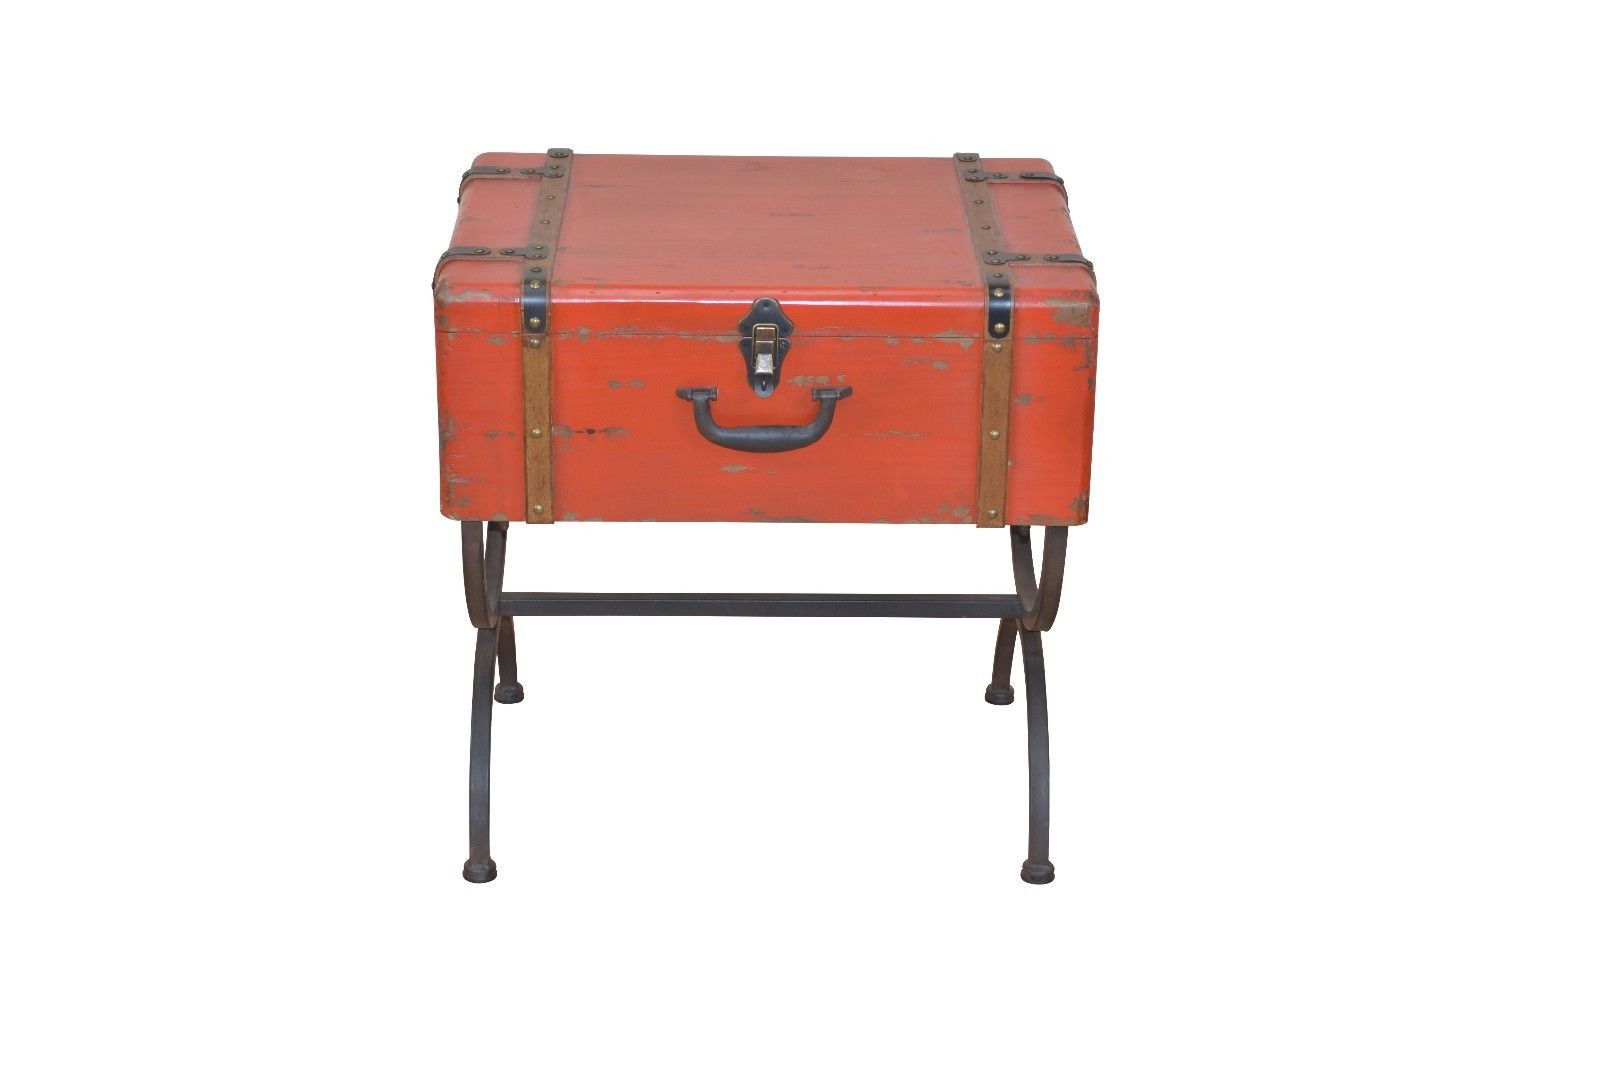 deko truhe holz good deko truhe holz with deko truhe holz gallery of deko truhe holz with deko. Black Bedroom Furniture Sets. Home Design Ideas